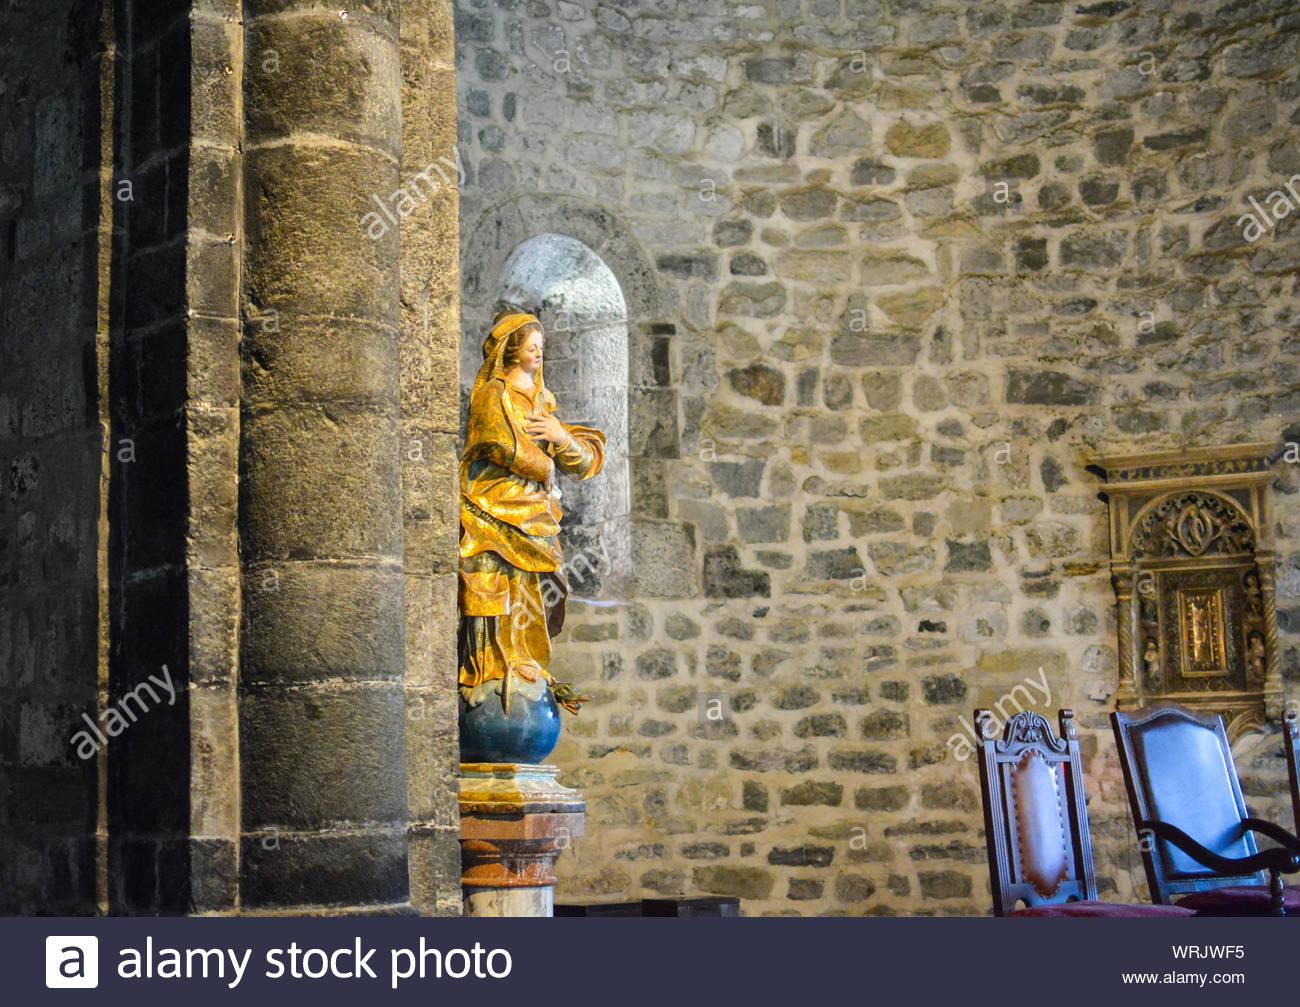 A statue of the Virgin Mary inside the Interior of Santa Margherita di Antiochia Church, in the Cinque Terre village of Vernazza, Liguria, Italy Stock Photo